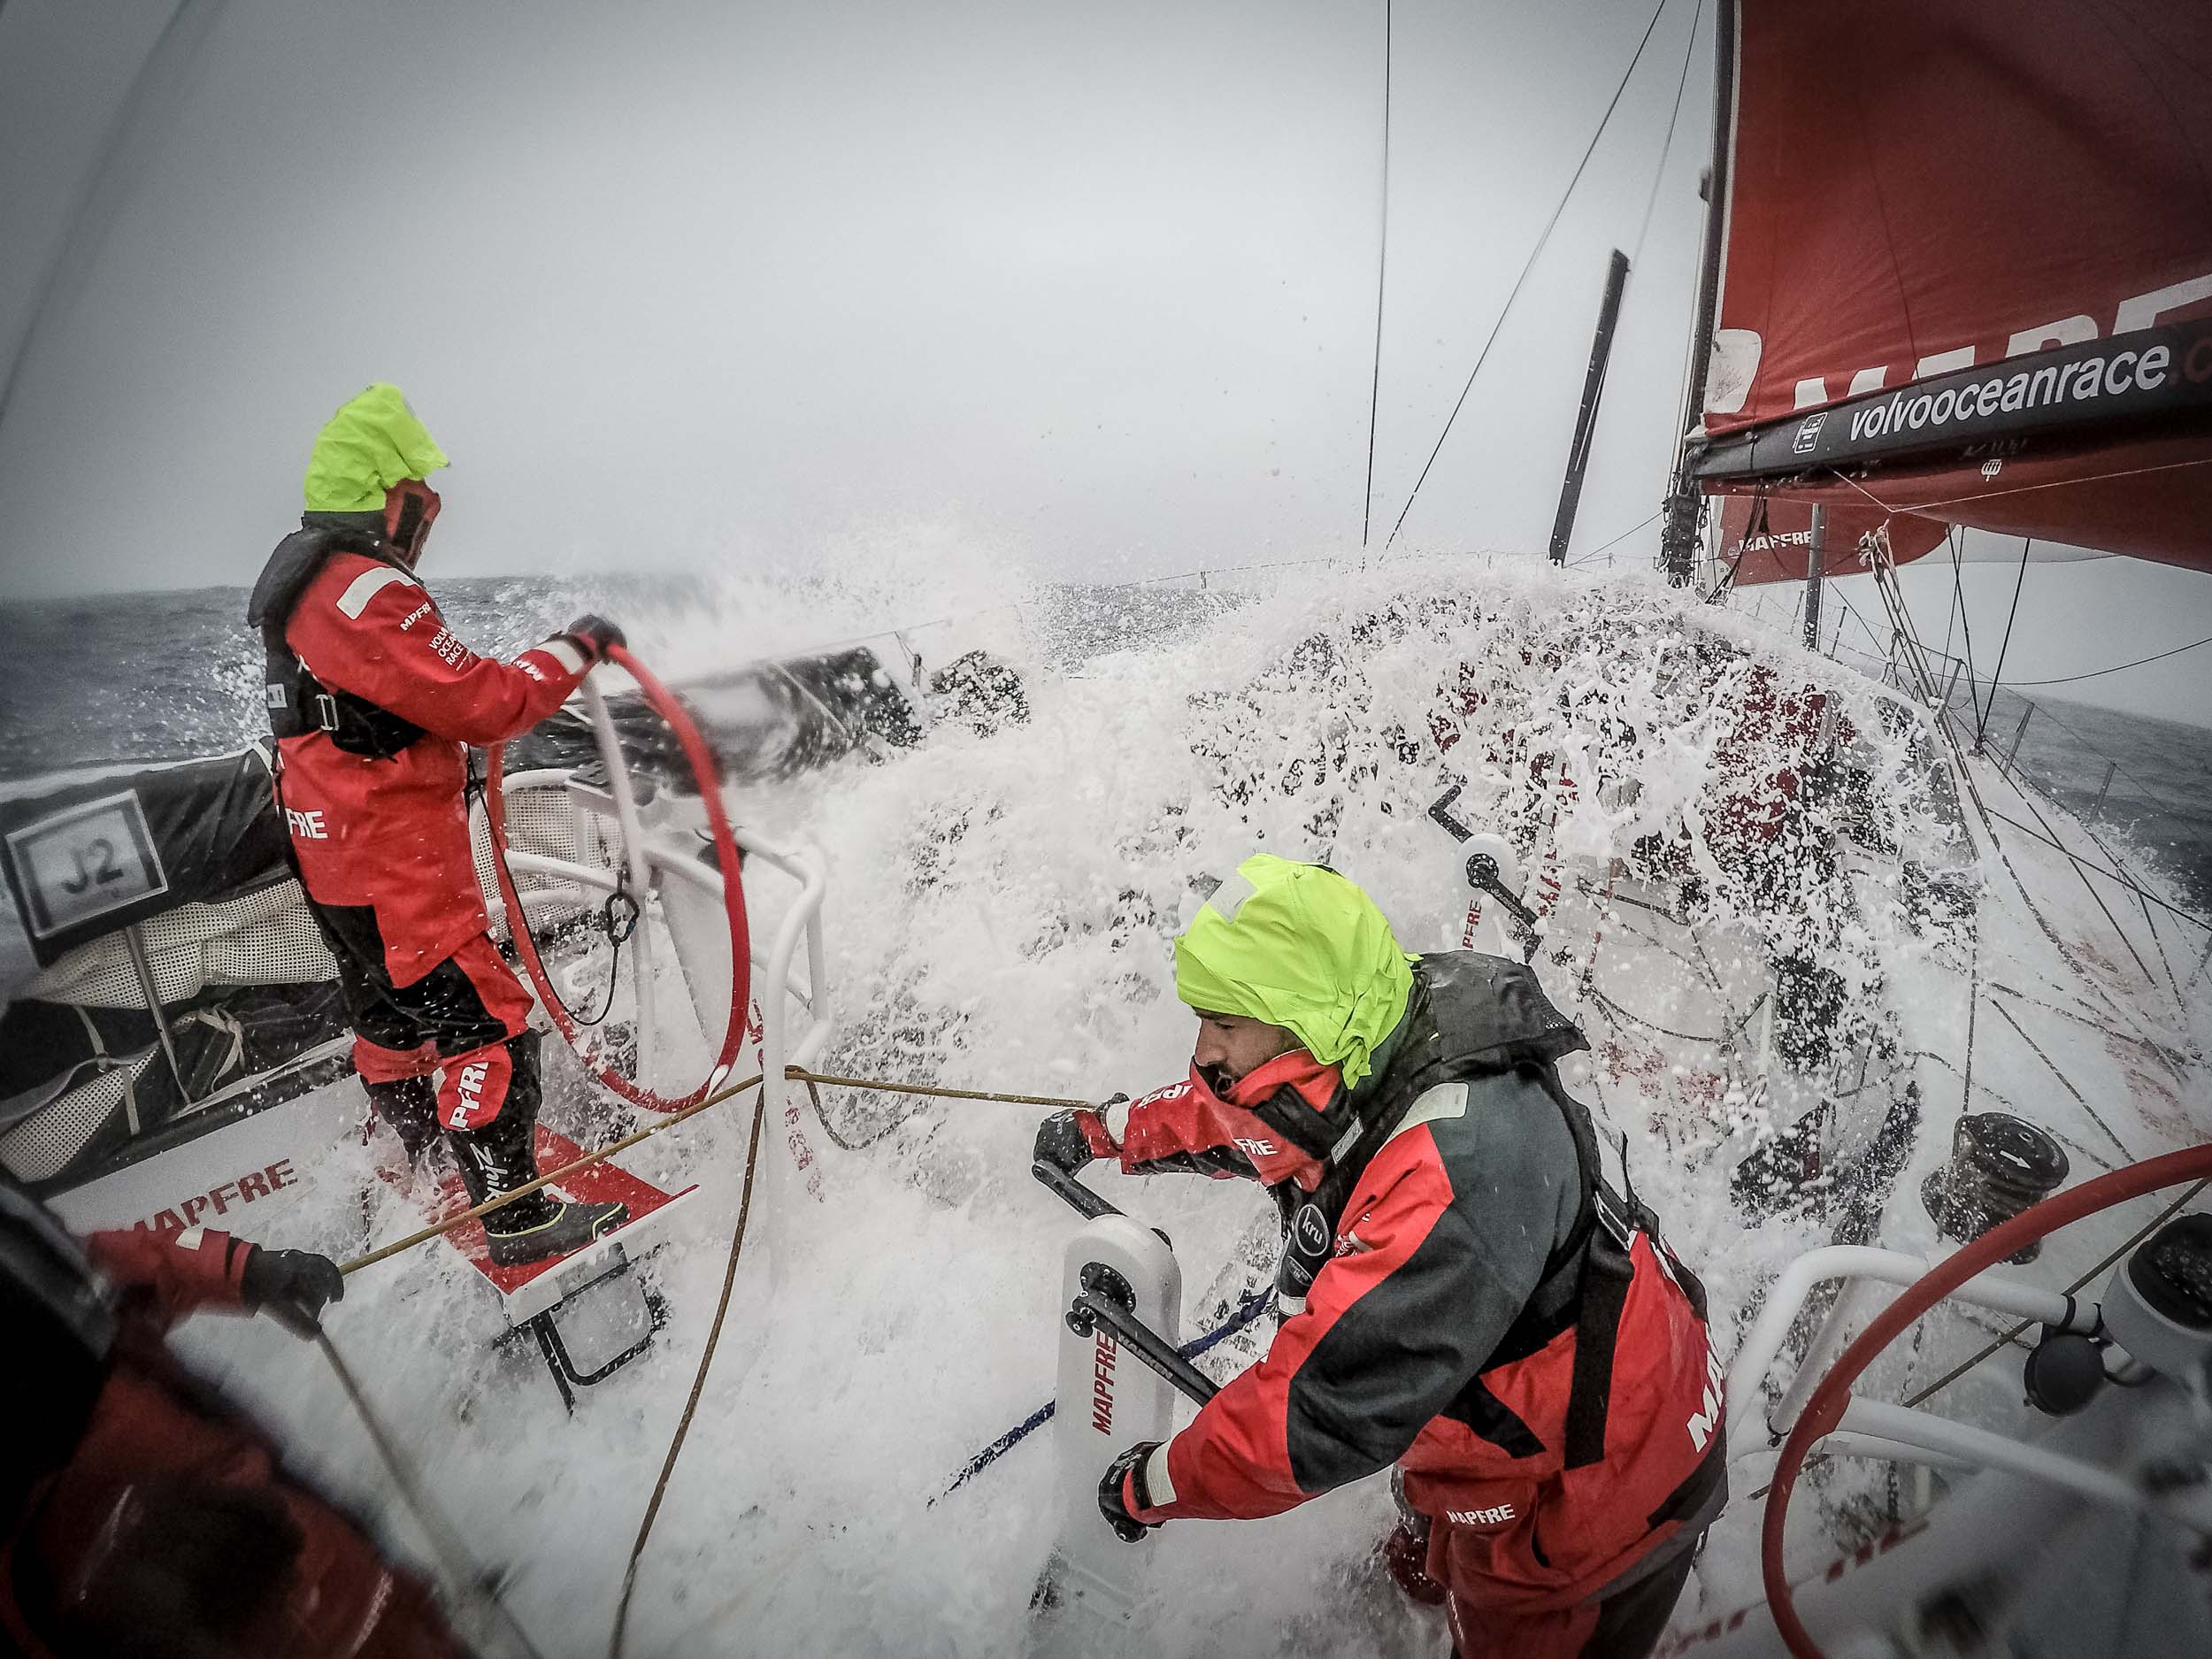 Volvo Ocean Race 2014 - 15 Leg 5 to Itajai